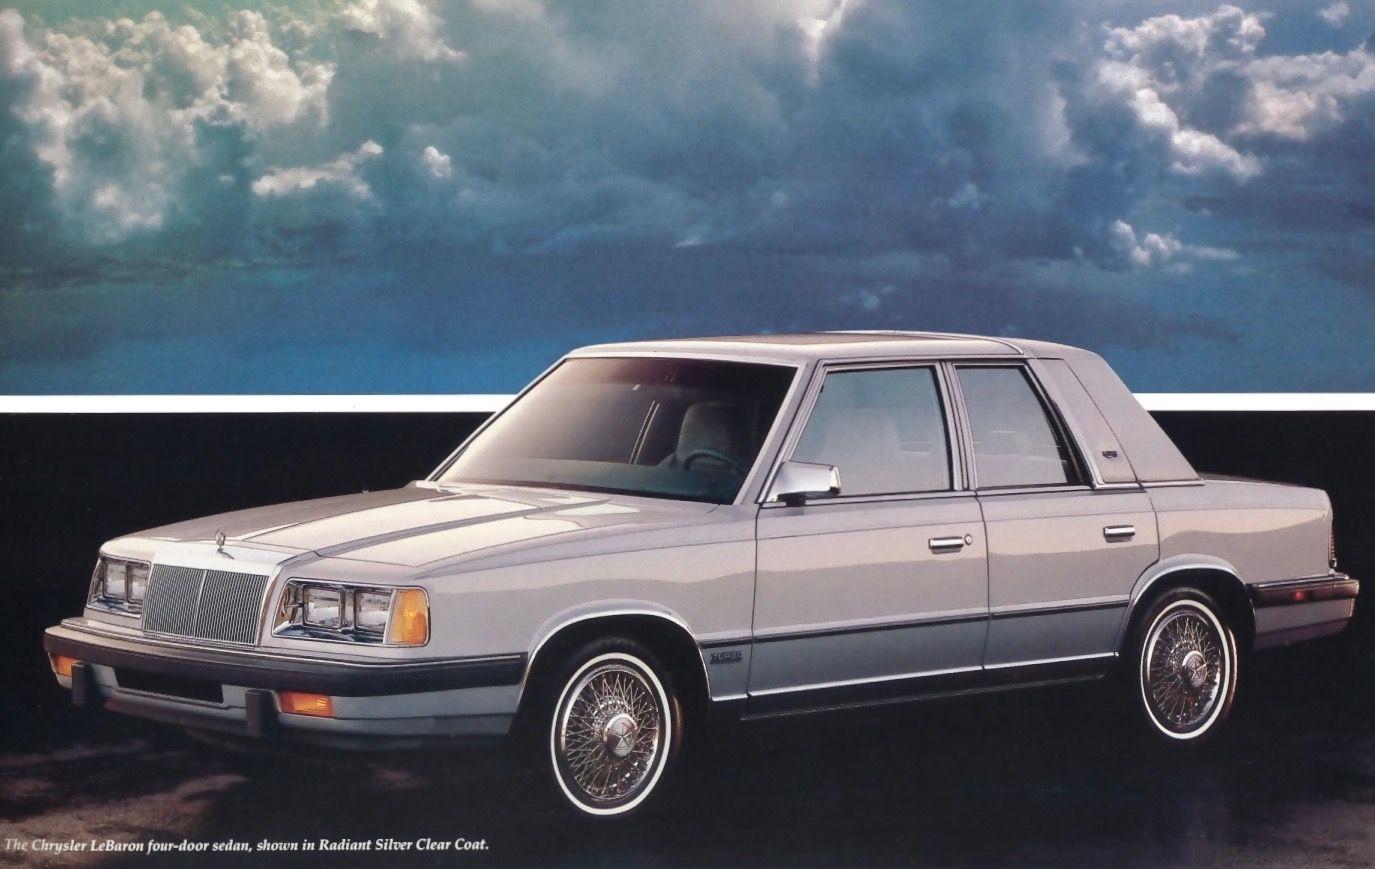 1988 Chrysler Lebaron Sedan With Images Chrysler Lebaron